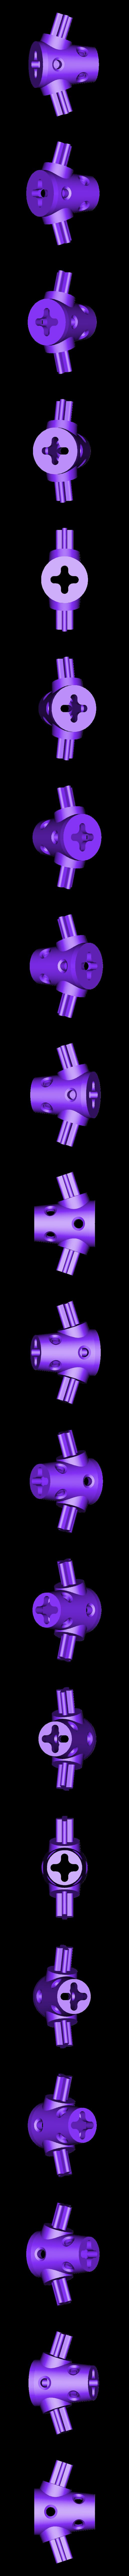 Planet Carrier middle.STL Download free STL file Epicyclic Bevel Gear Toy • 3D printer design, montuparmar1